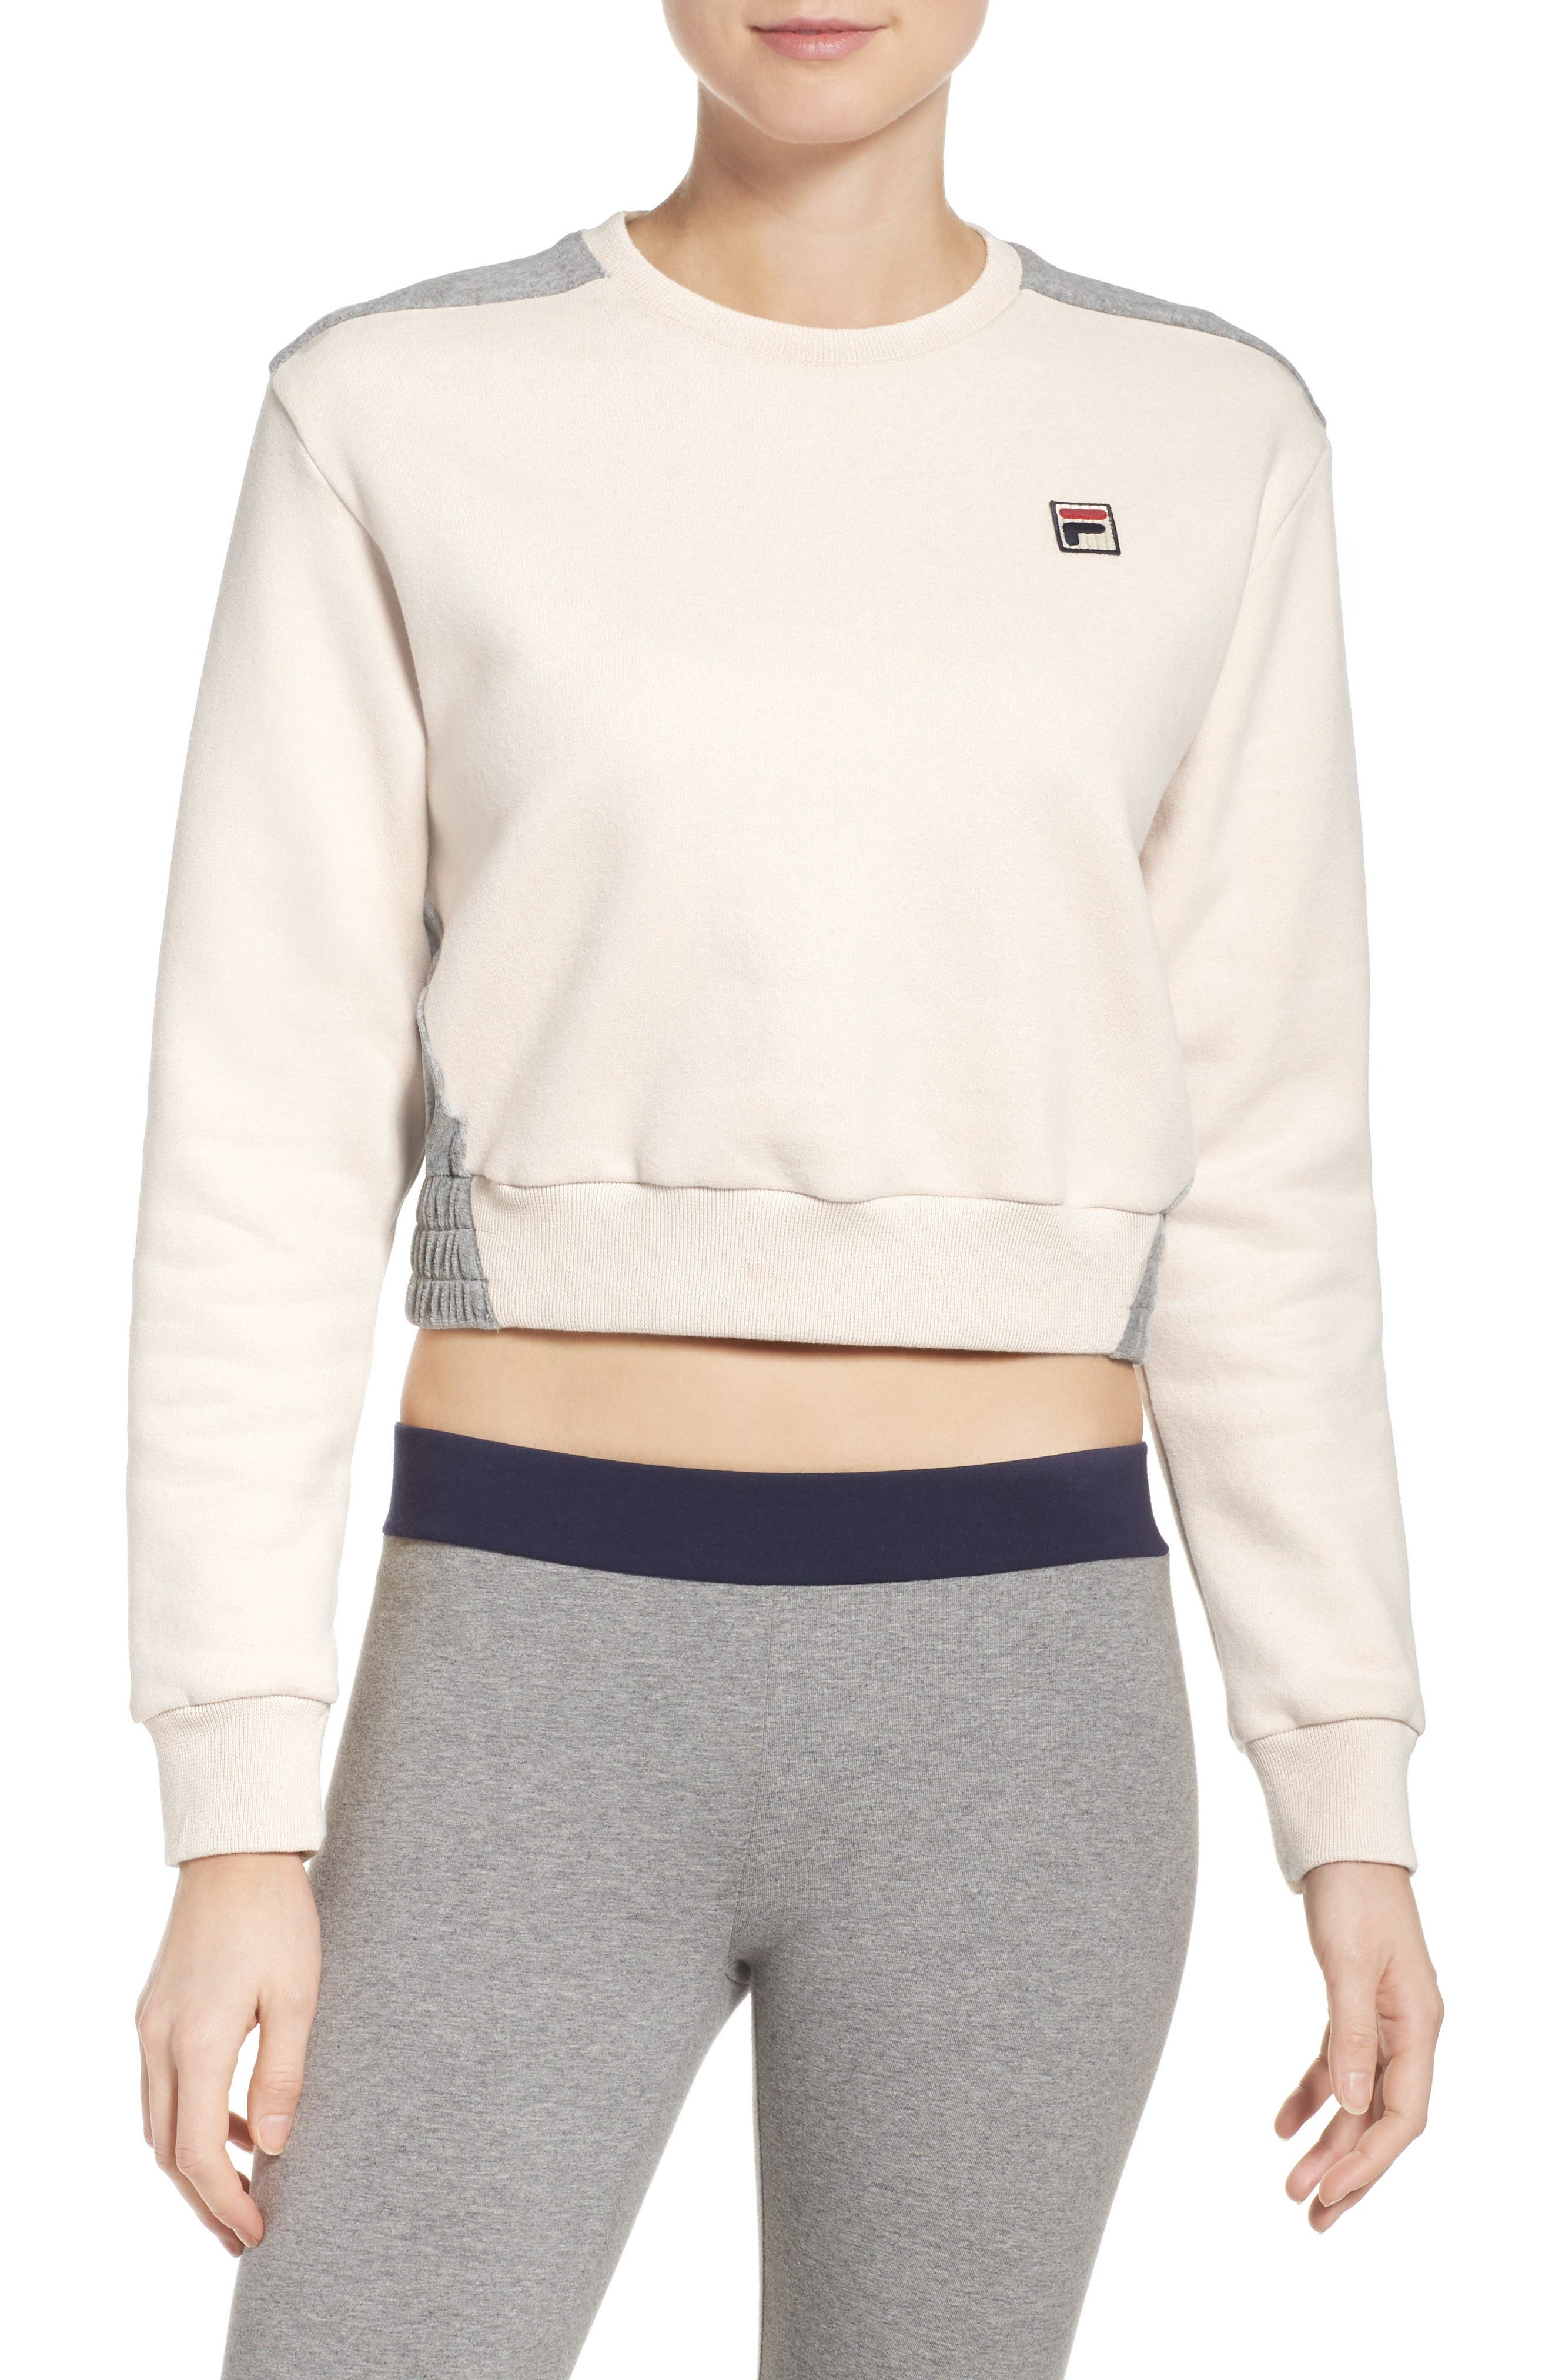 FILA Felicity Crop Sweatshirt